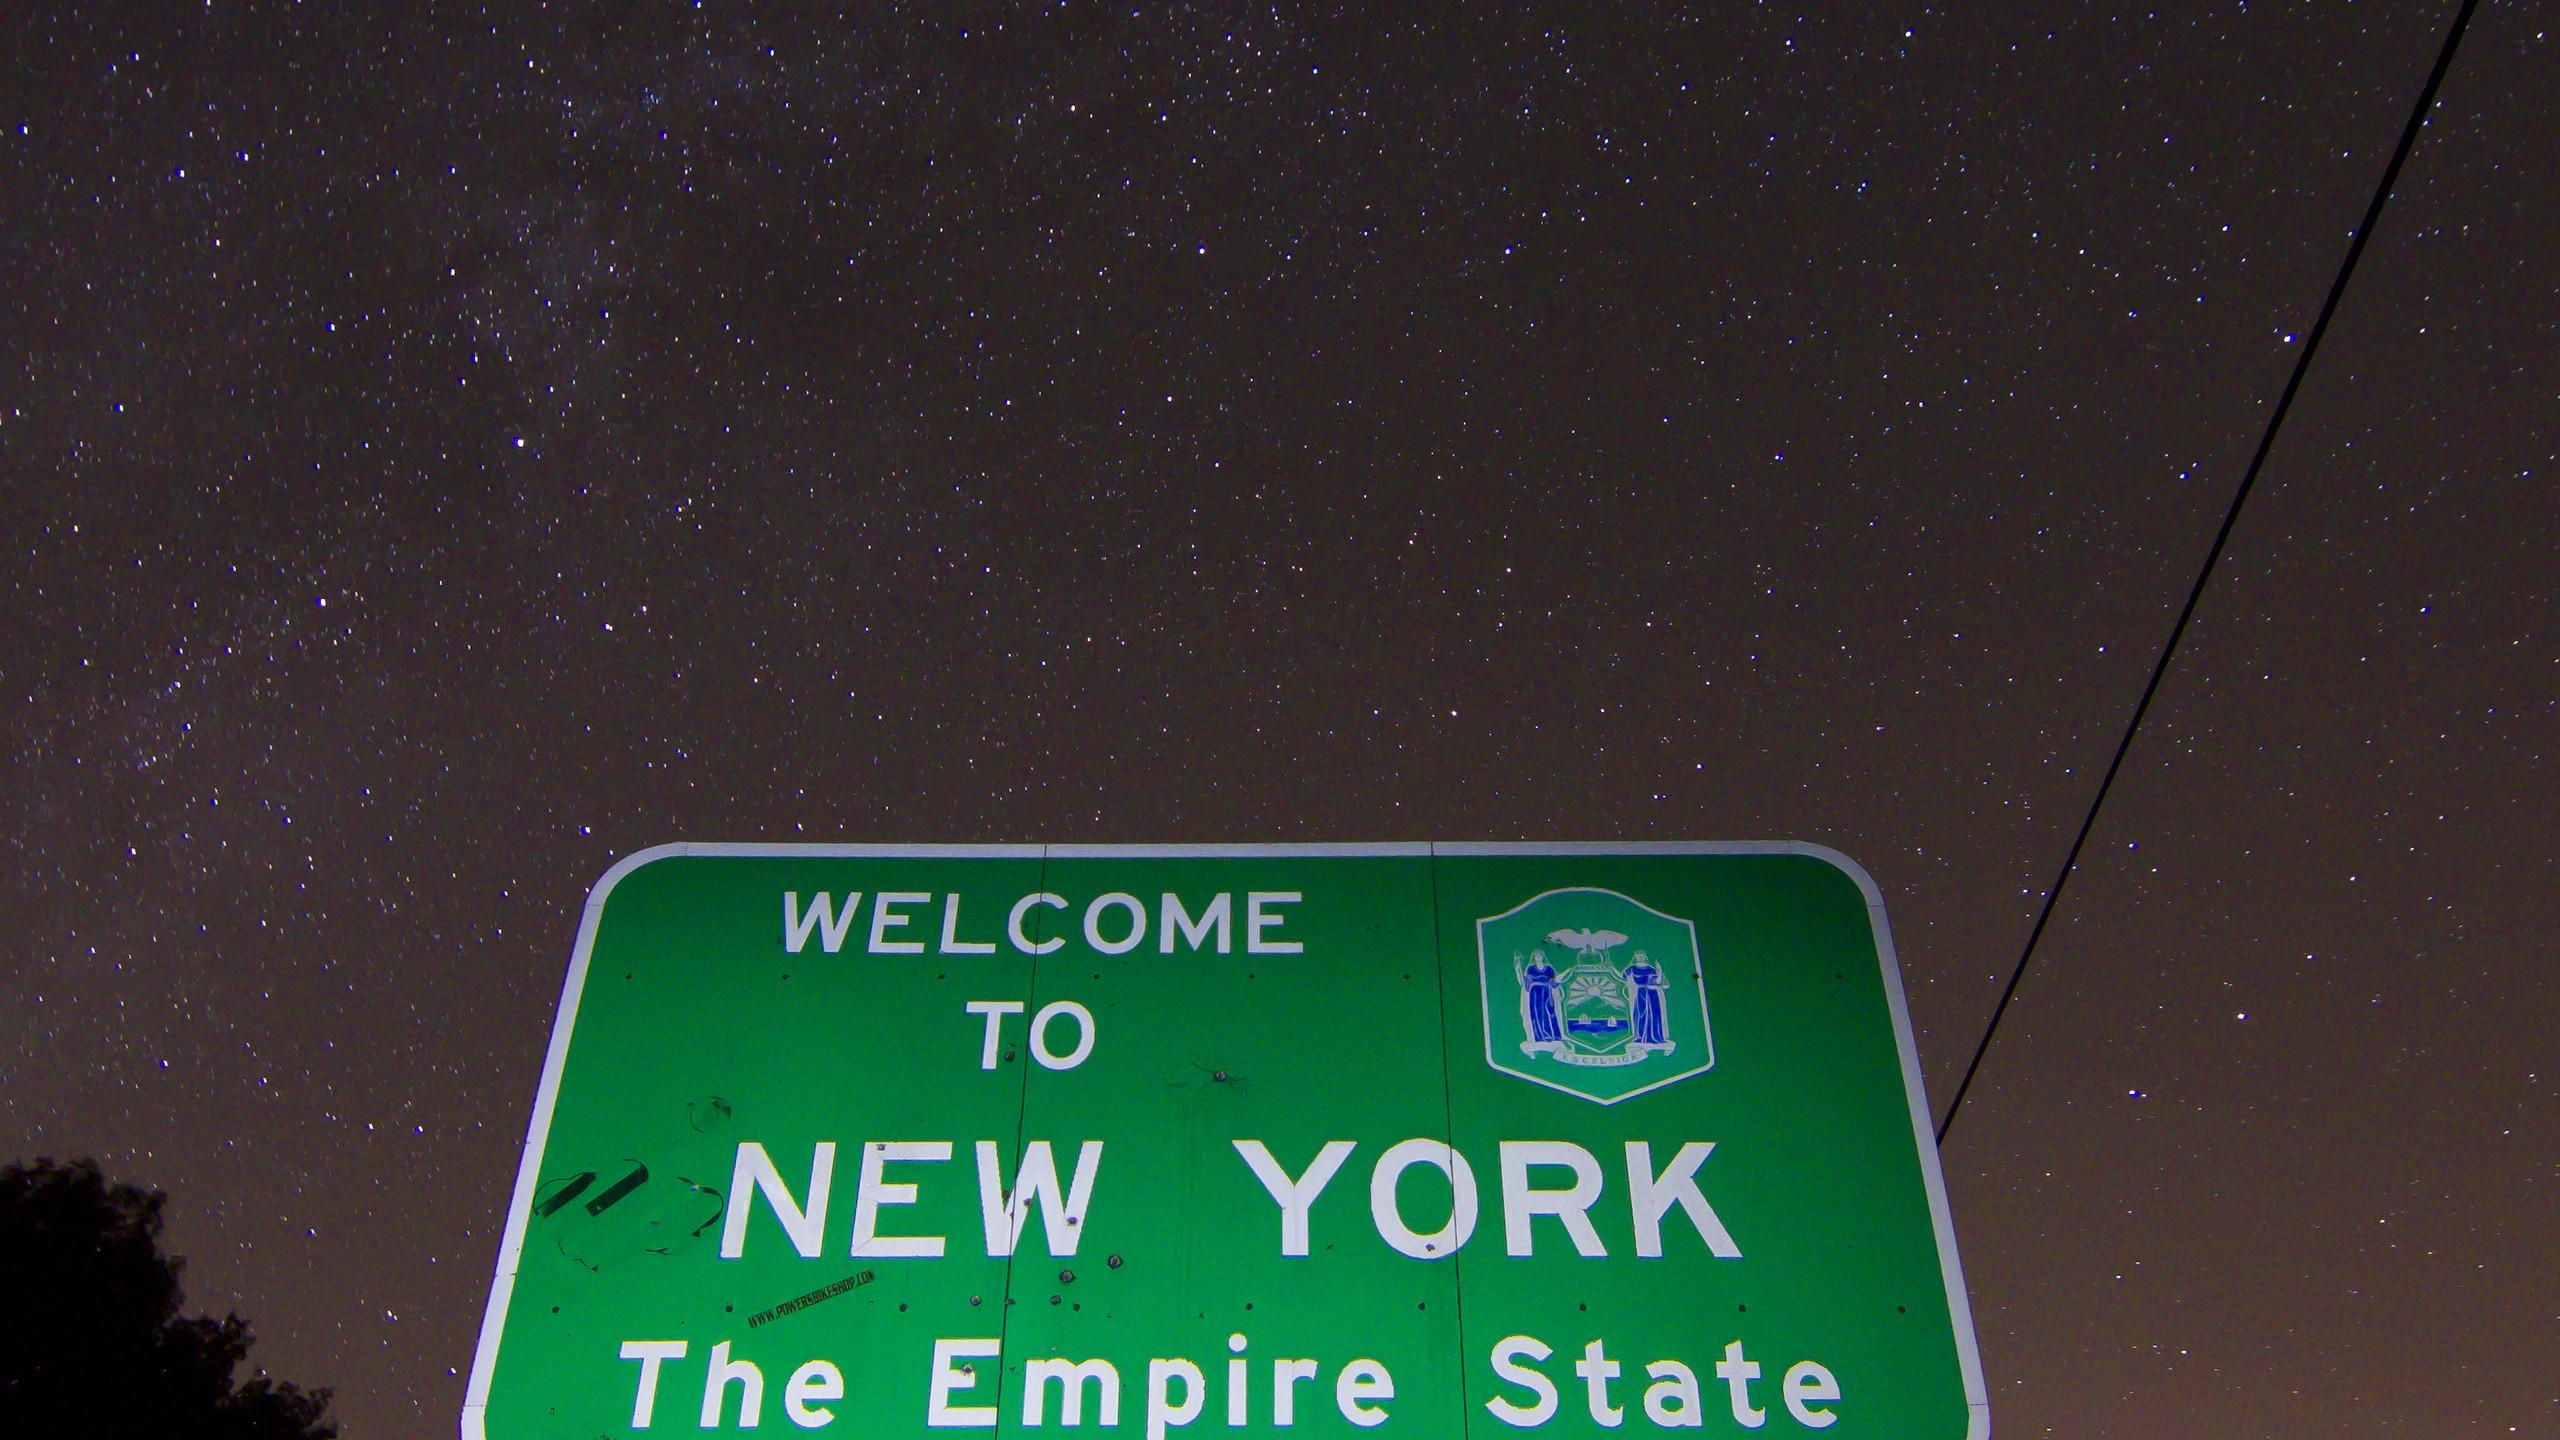 BOTPOST] Milky Way over the PANY State Line on US 62 iimgurcom 2560x1440